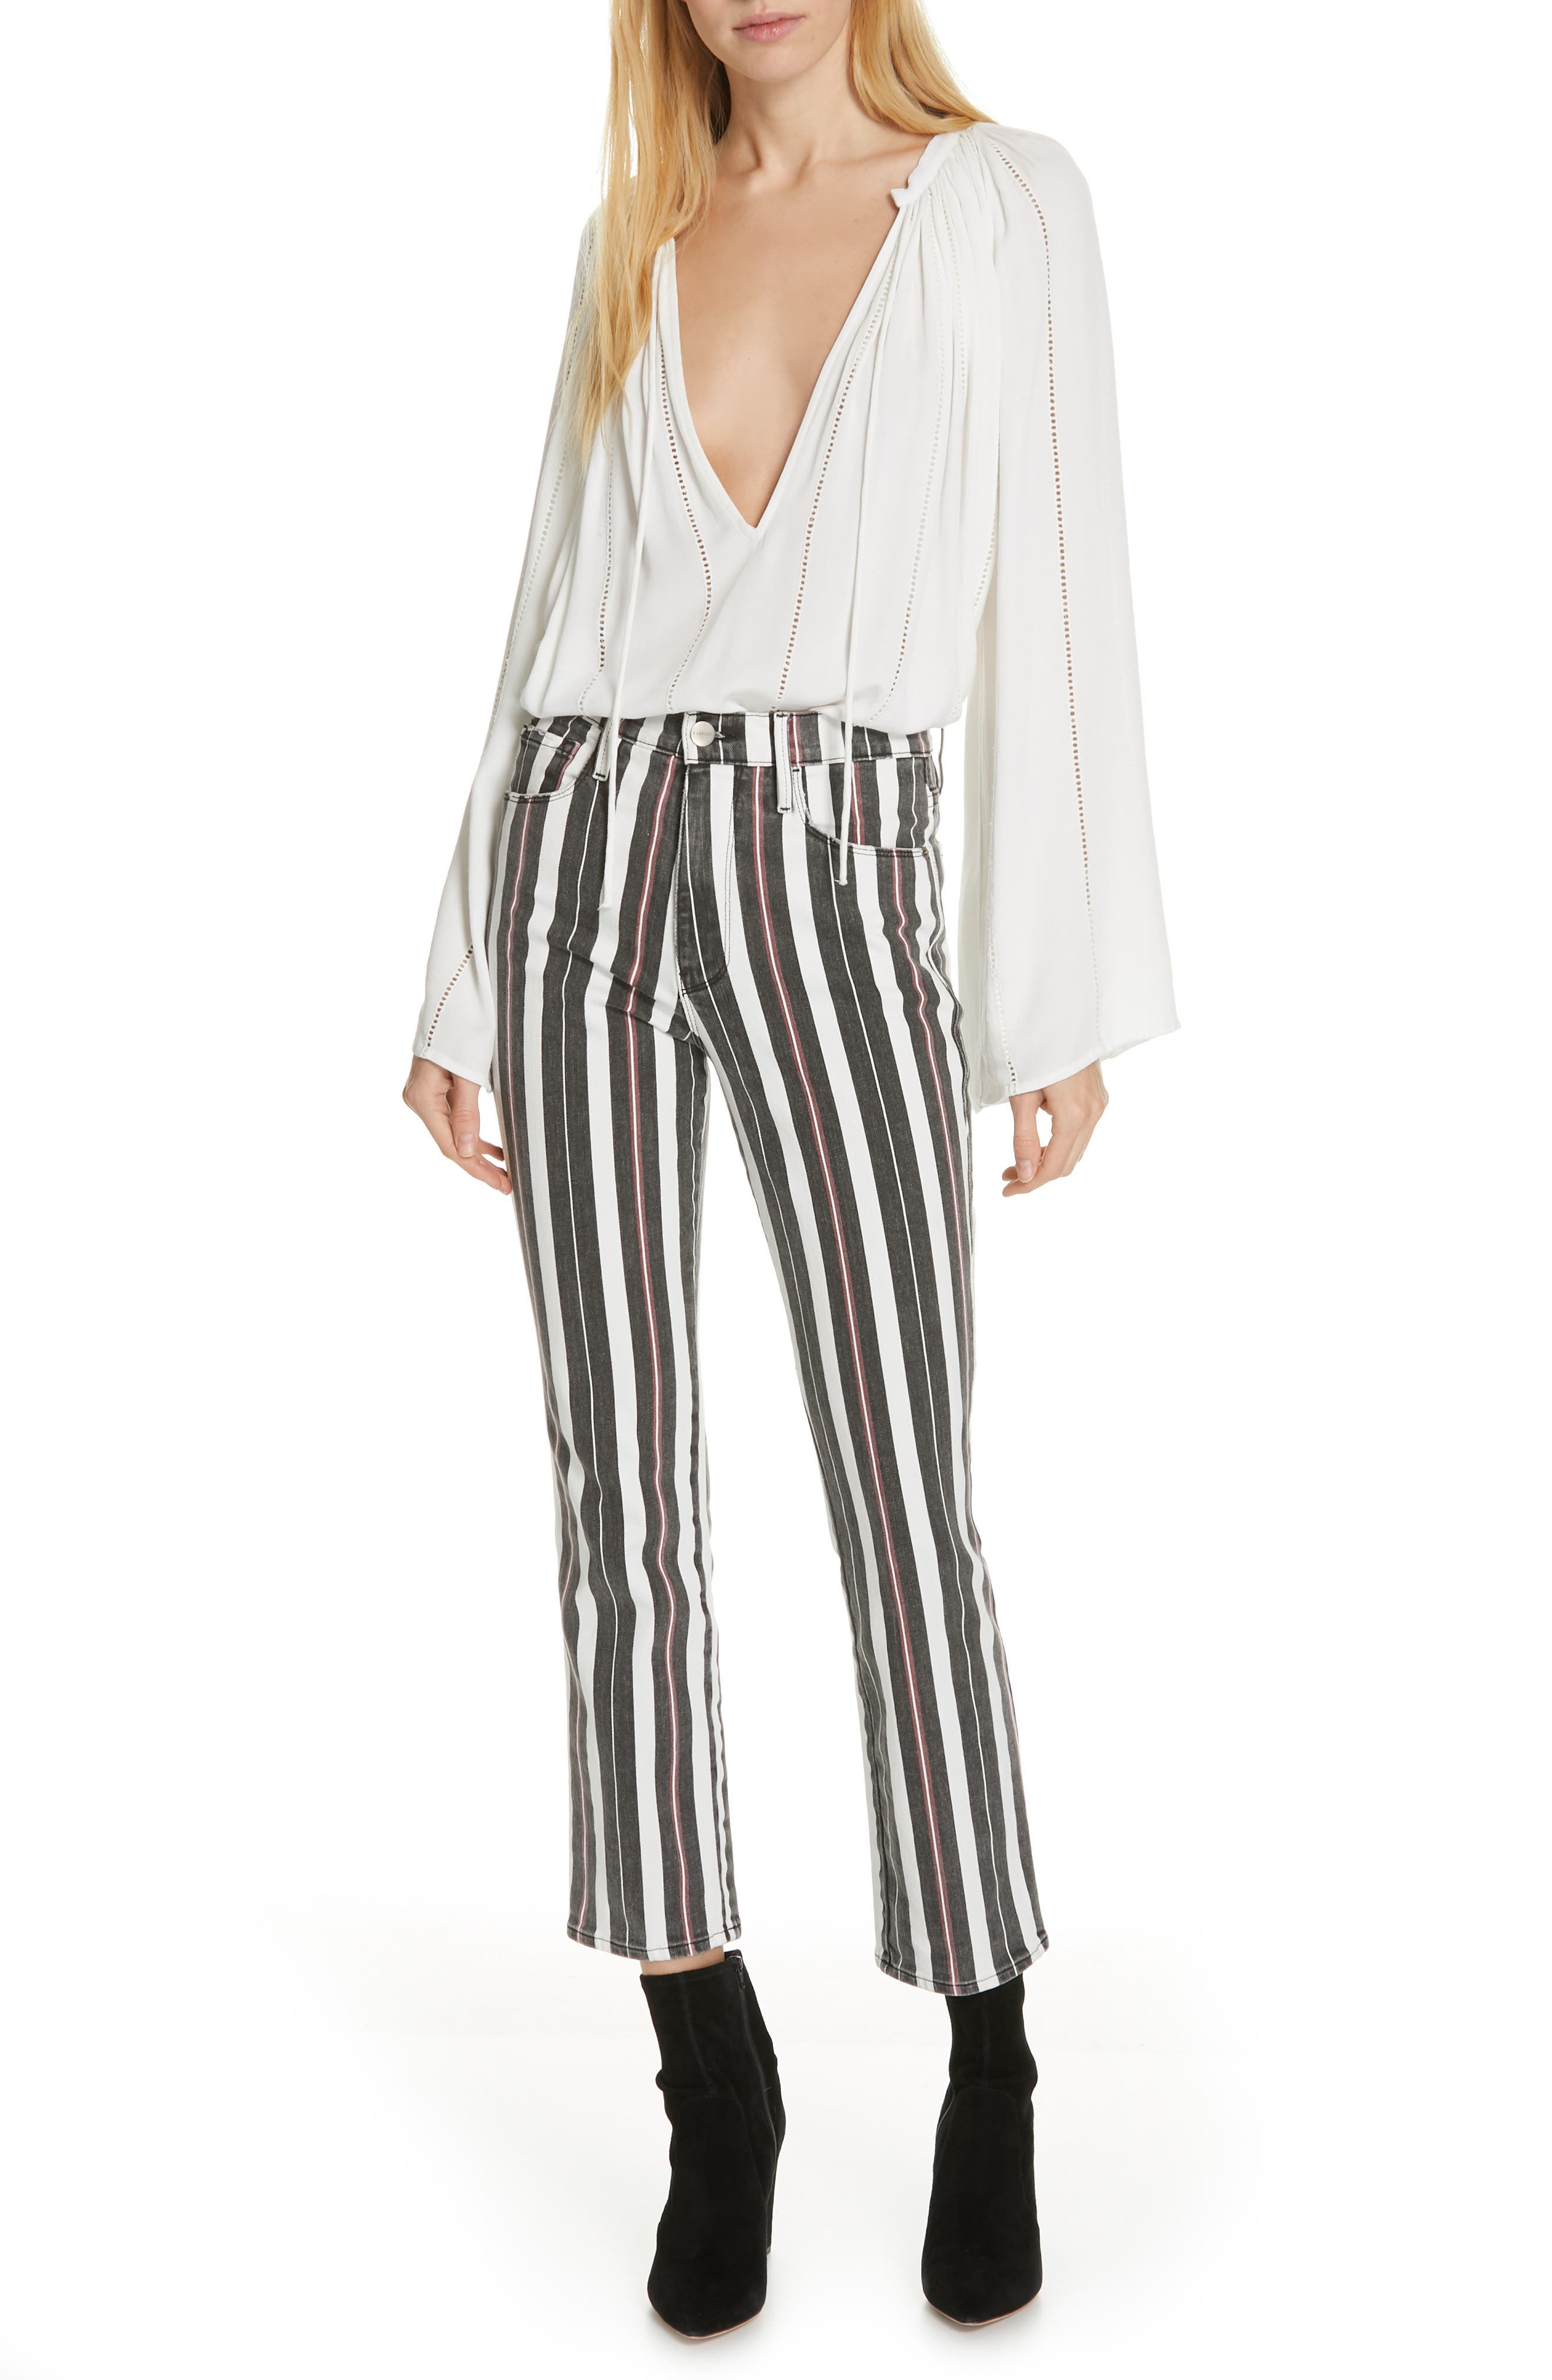 Le Sylvie Band Stripe Straight Leg Jeans,                             Alternate thumbnail 7, color,                             BAND STRIPE